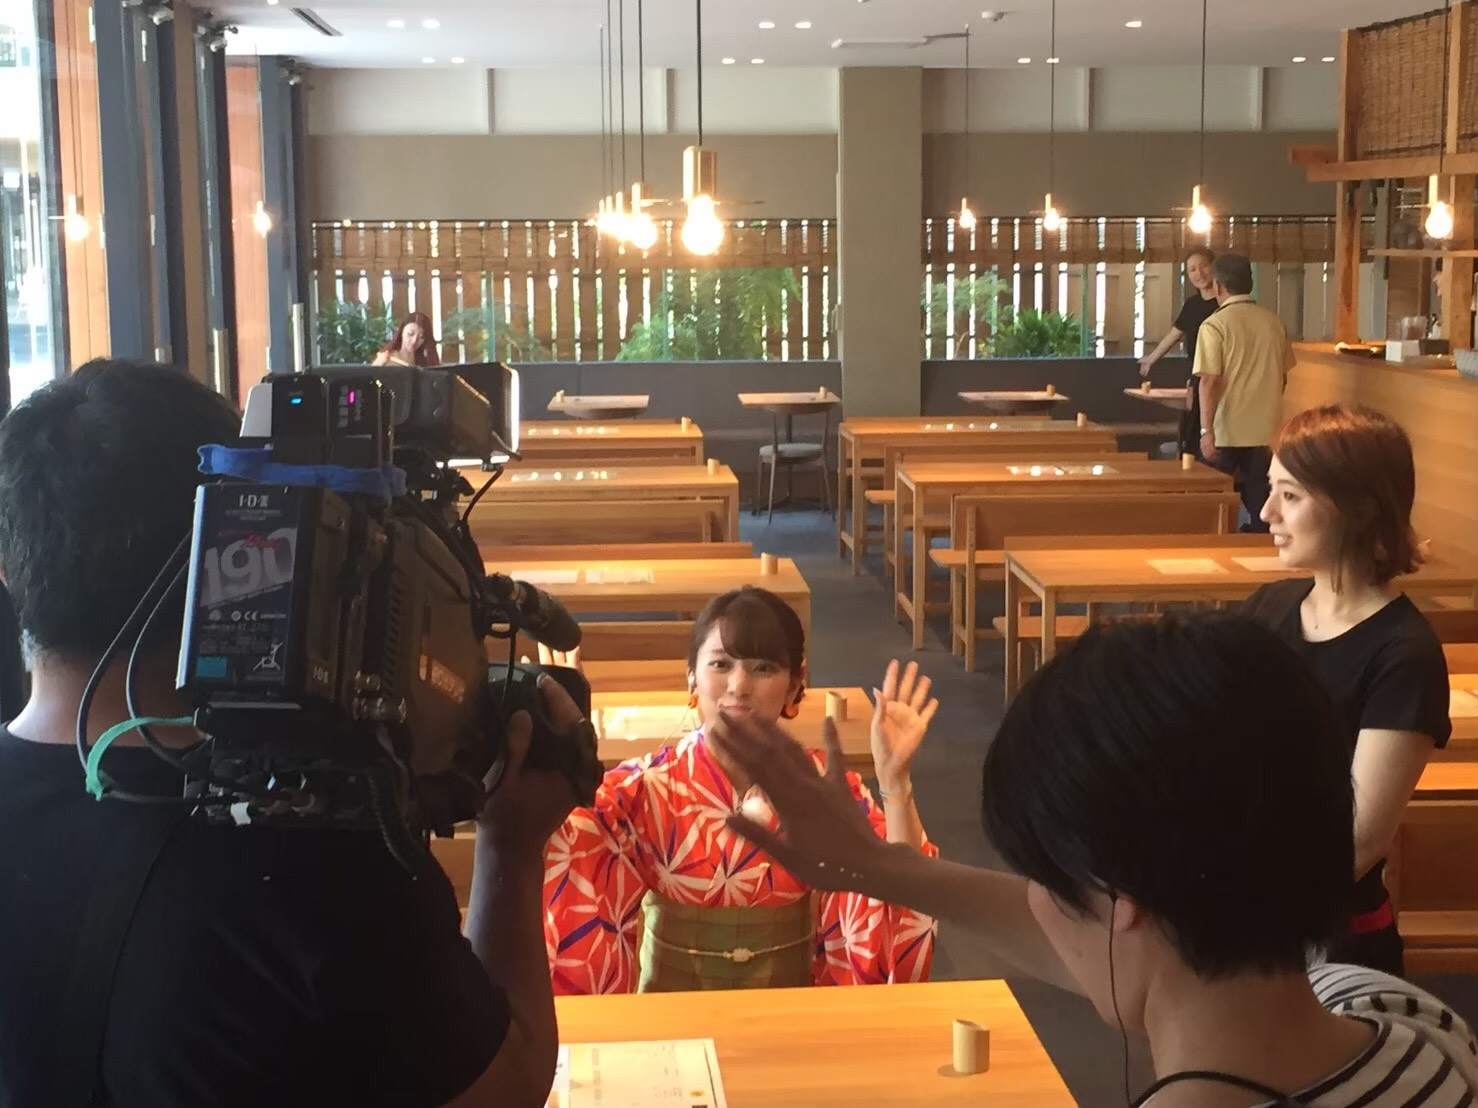 eo光 「ゲツ→キン」 取材1